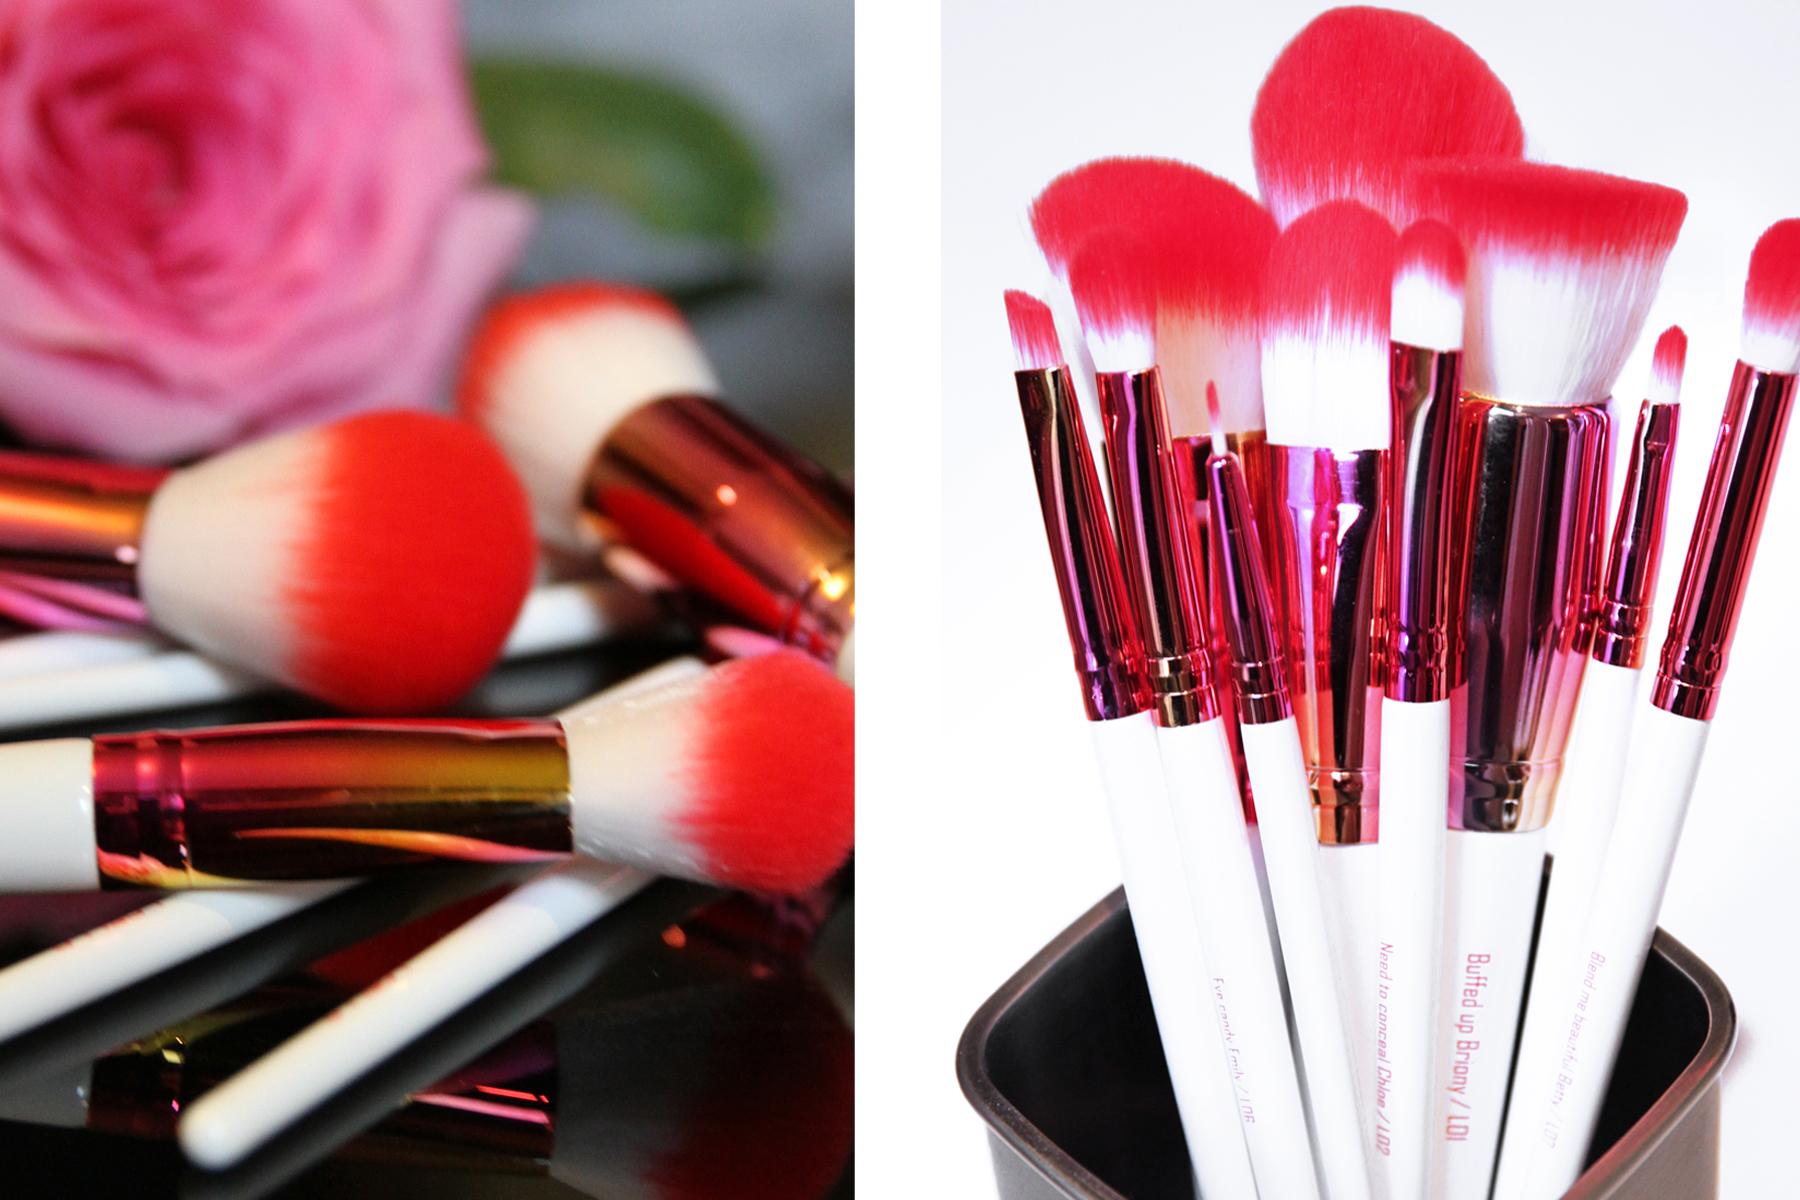 Loella Cosmetics Girl on Fire Brushes